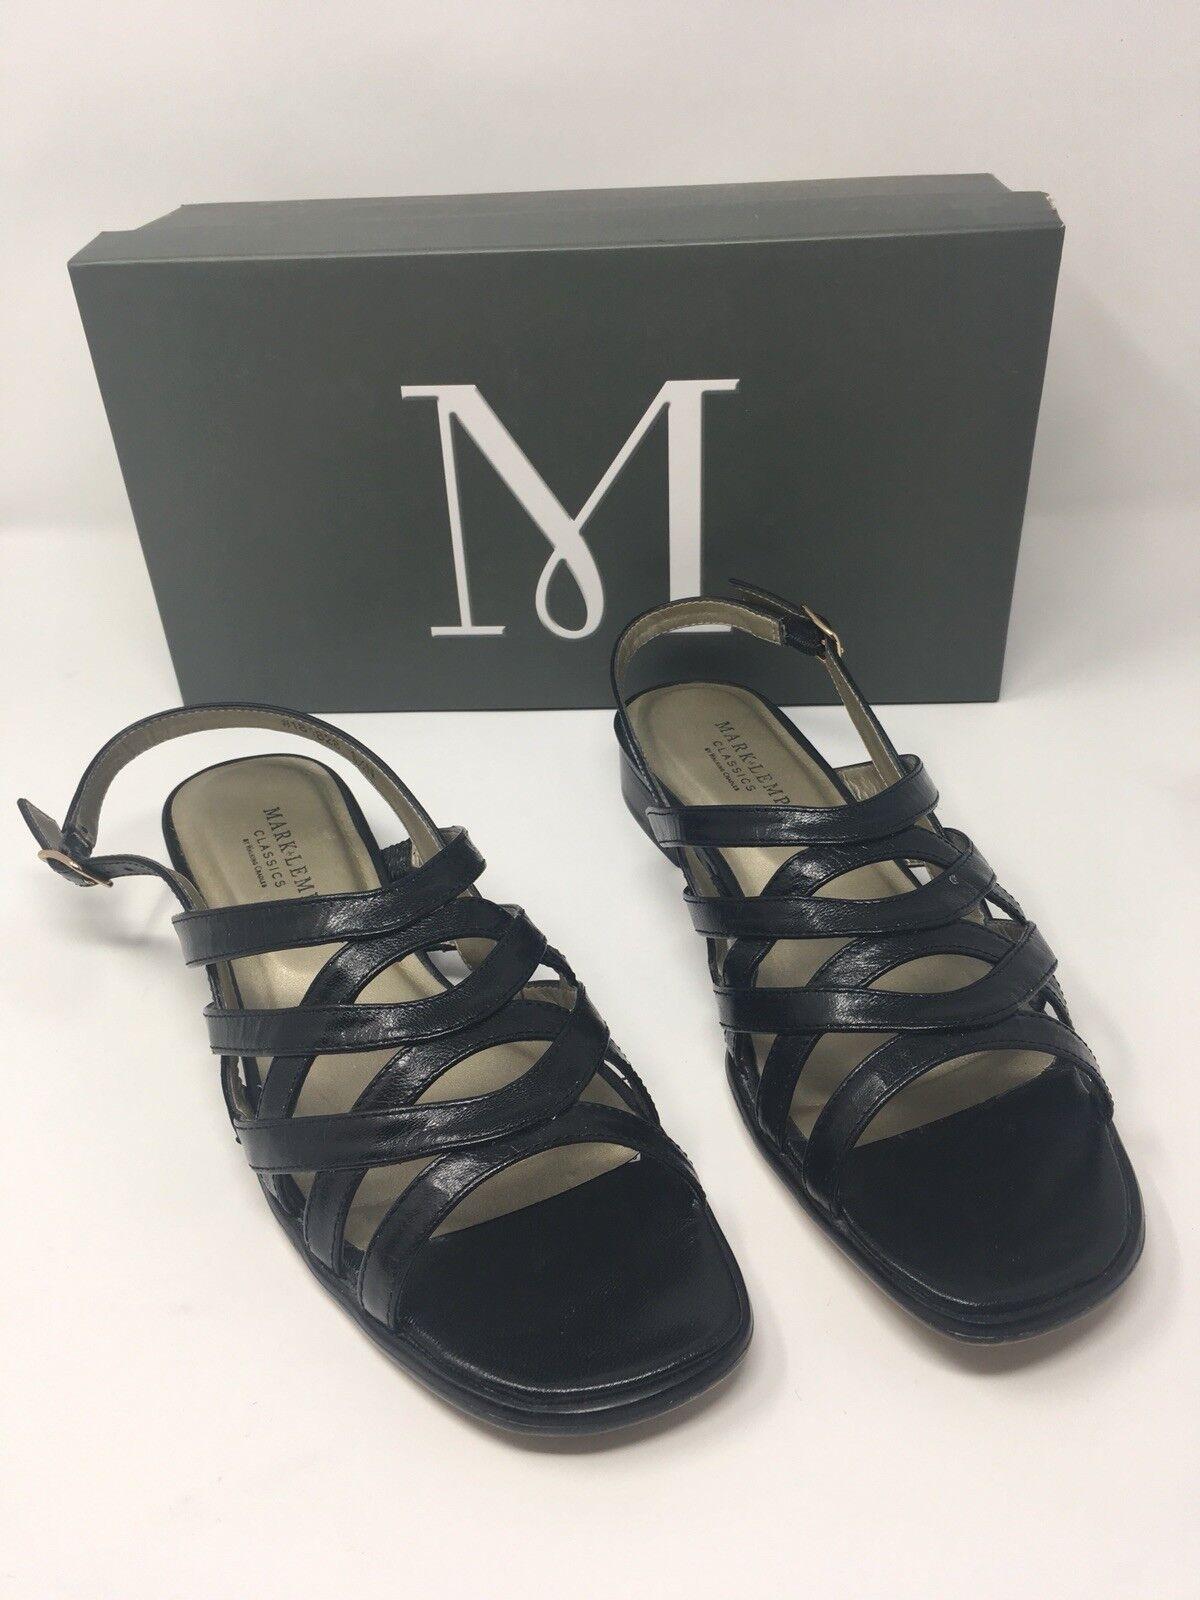 Mark Lemp Classics by Walking Cradles nero Sandal donna donna donna 8.5N Leather bb0493